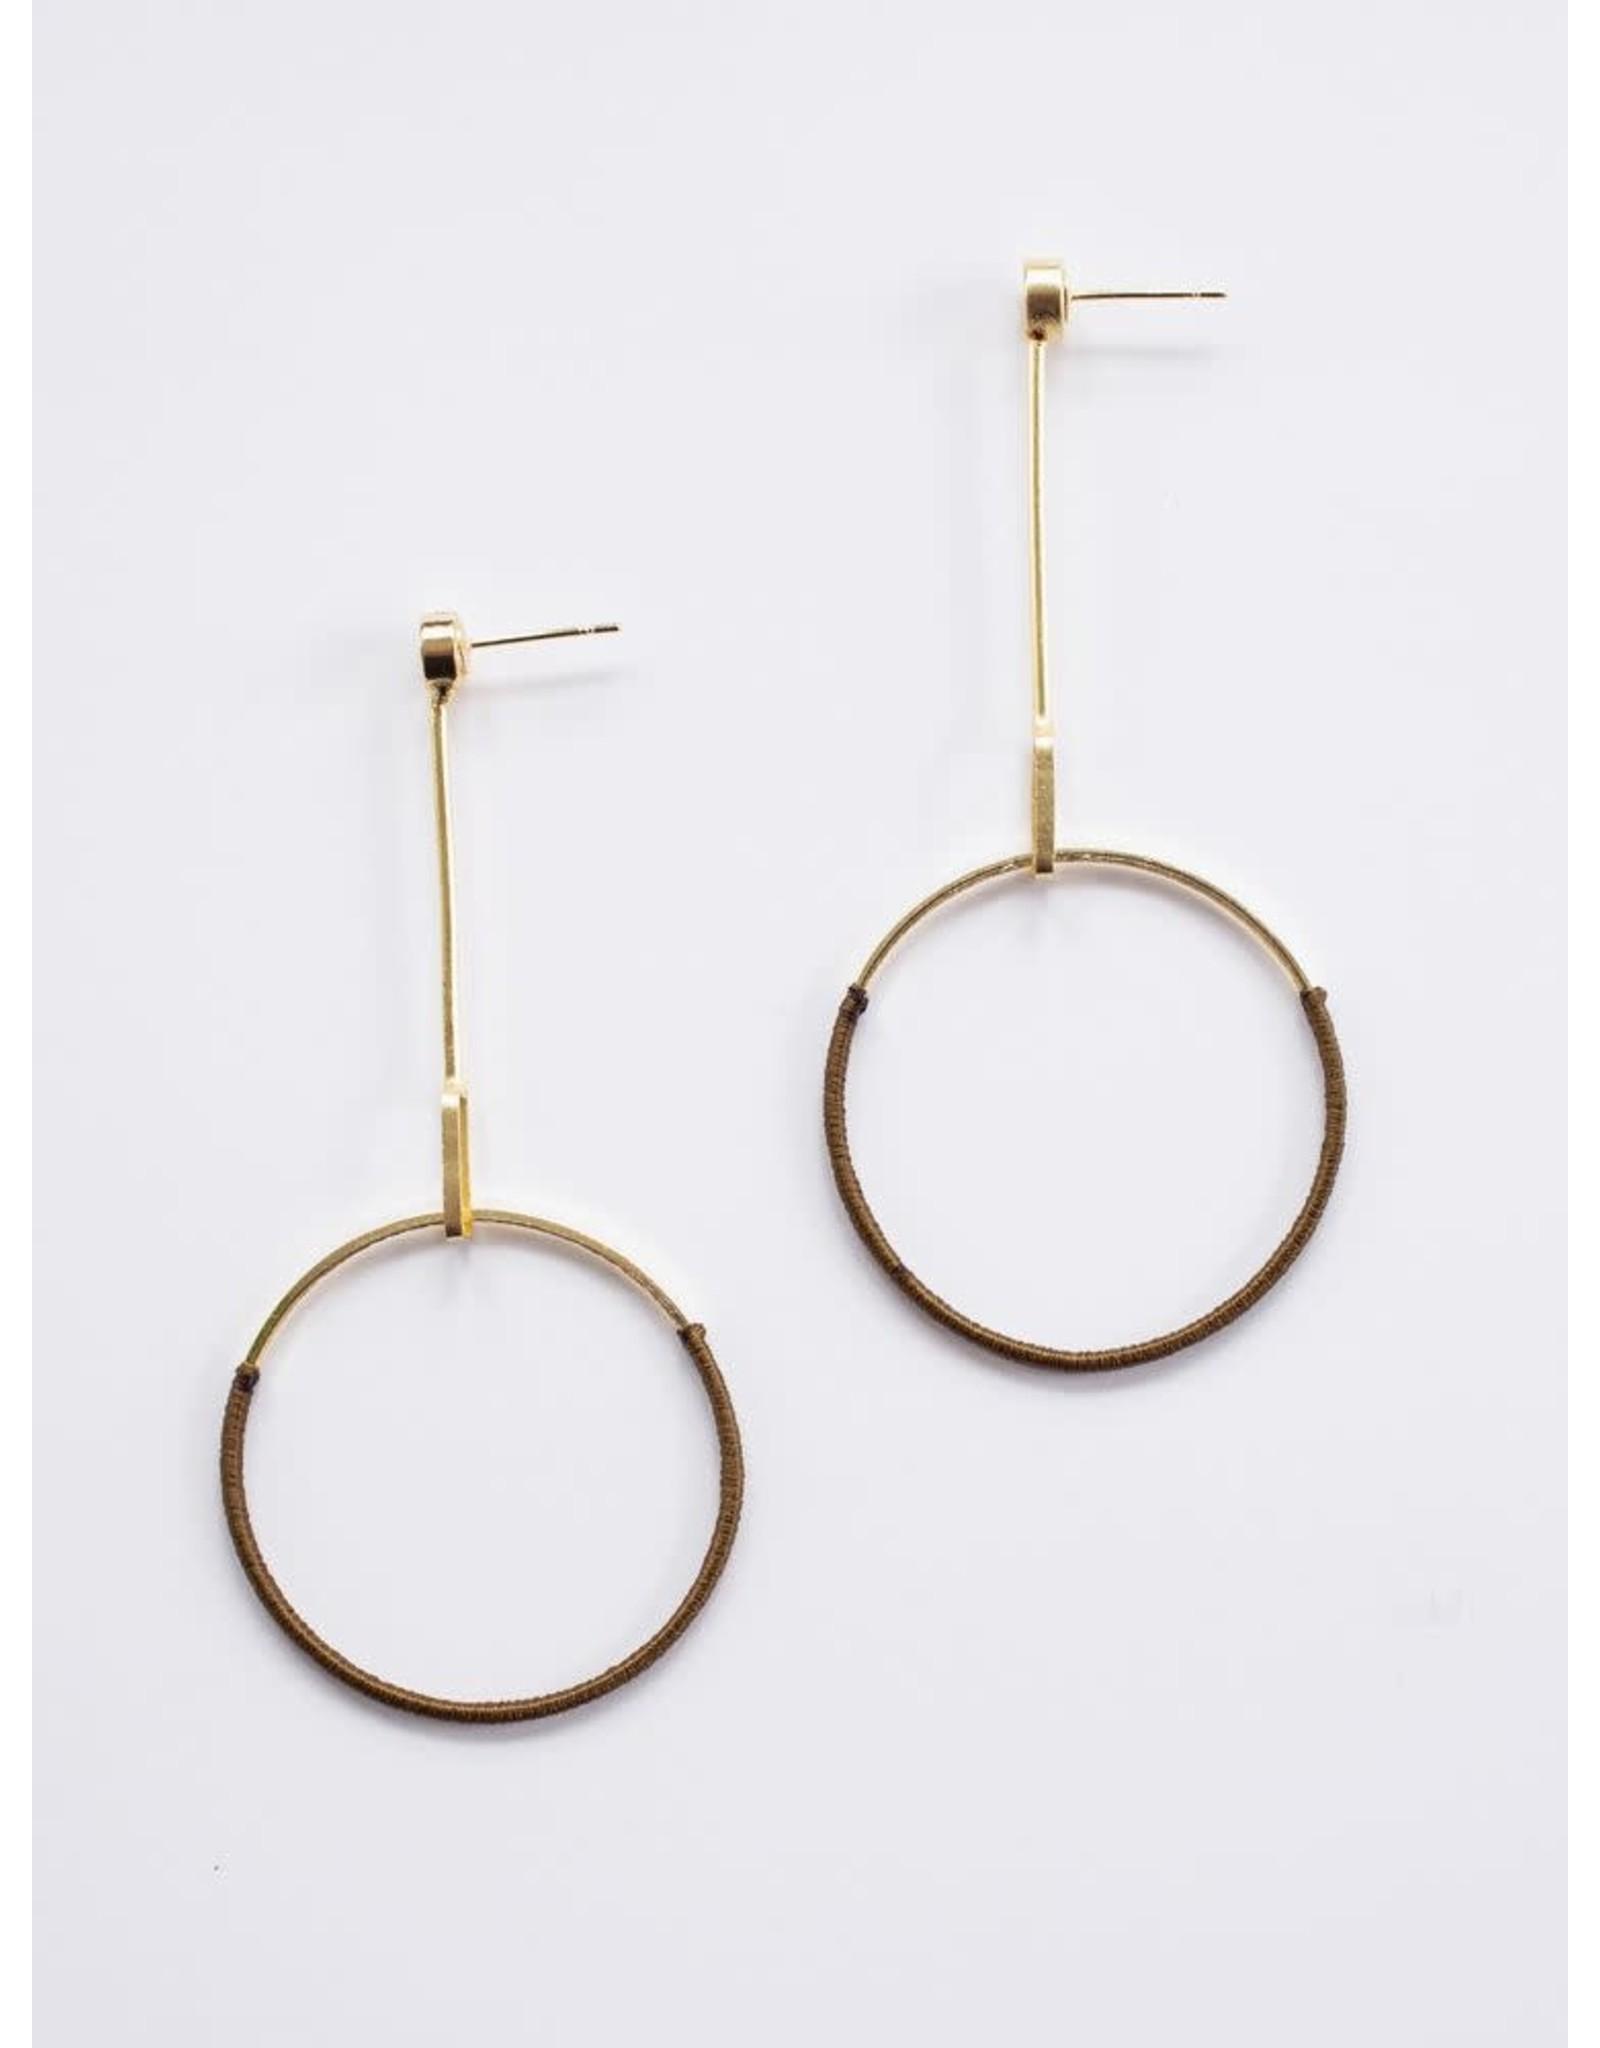 Pendulum Earrings, India